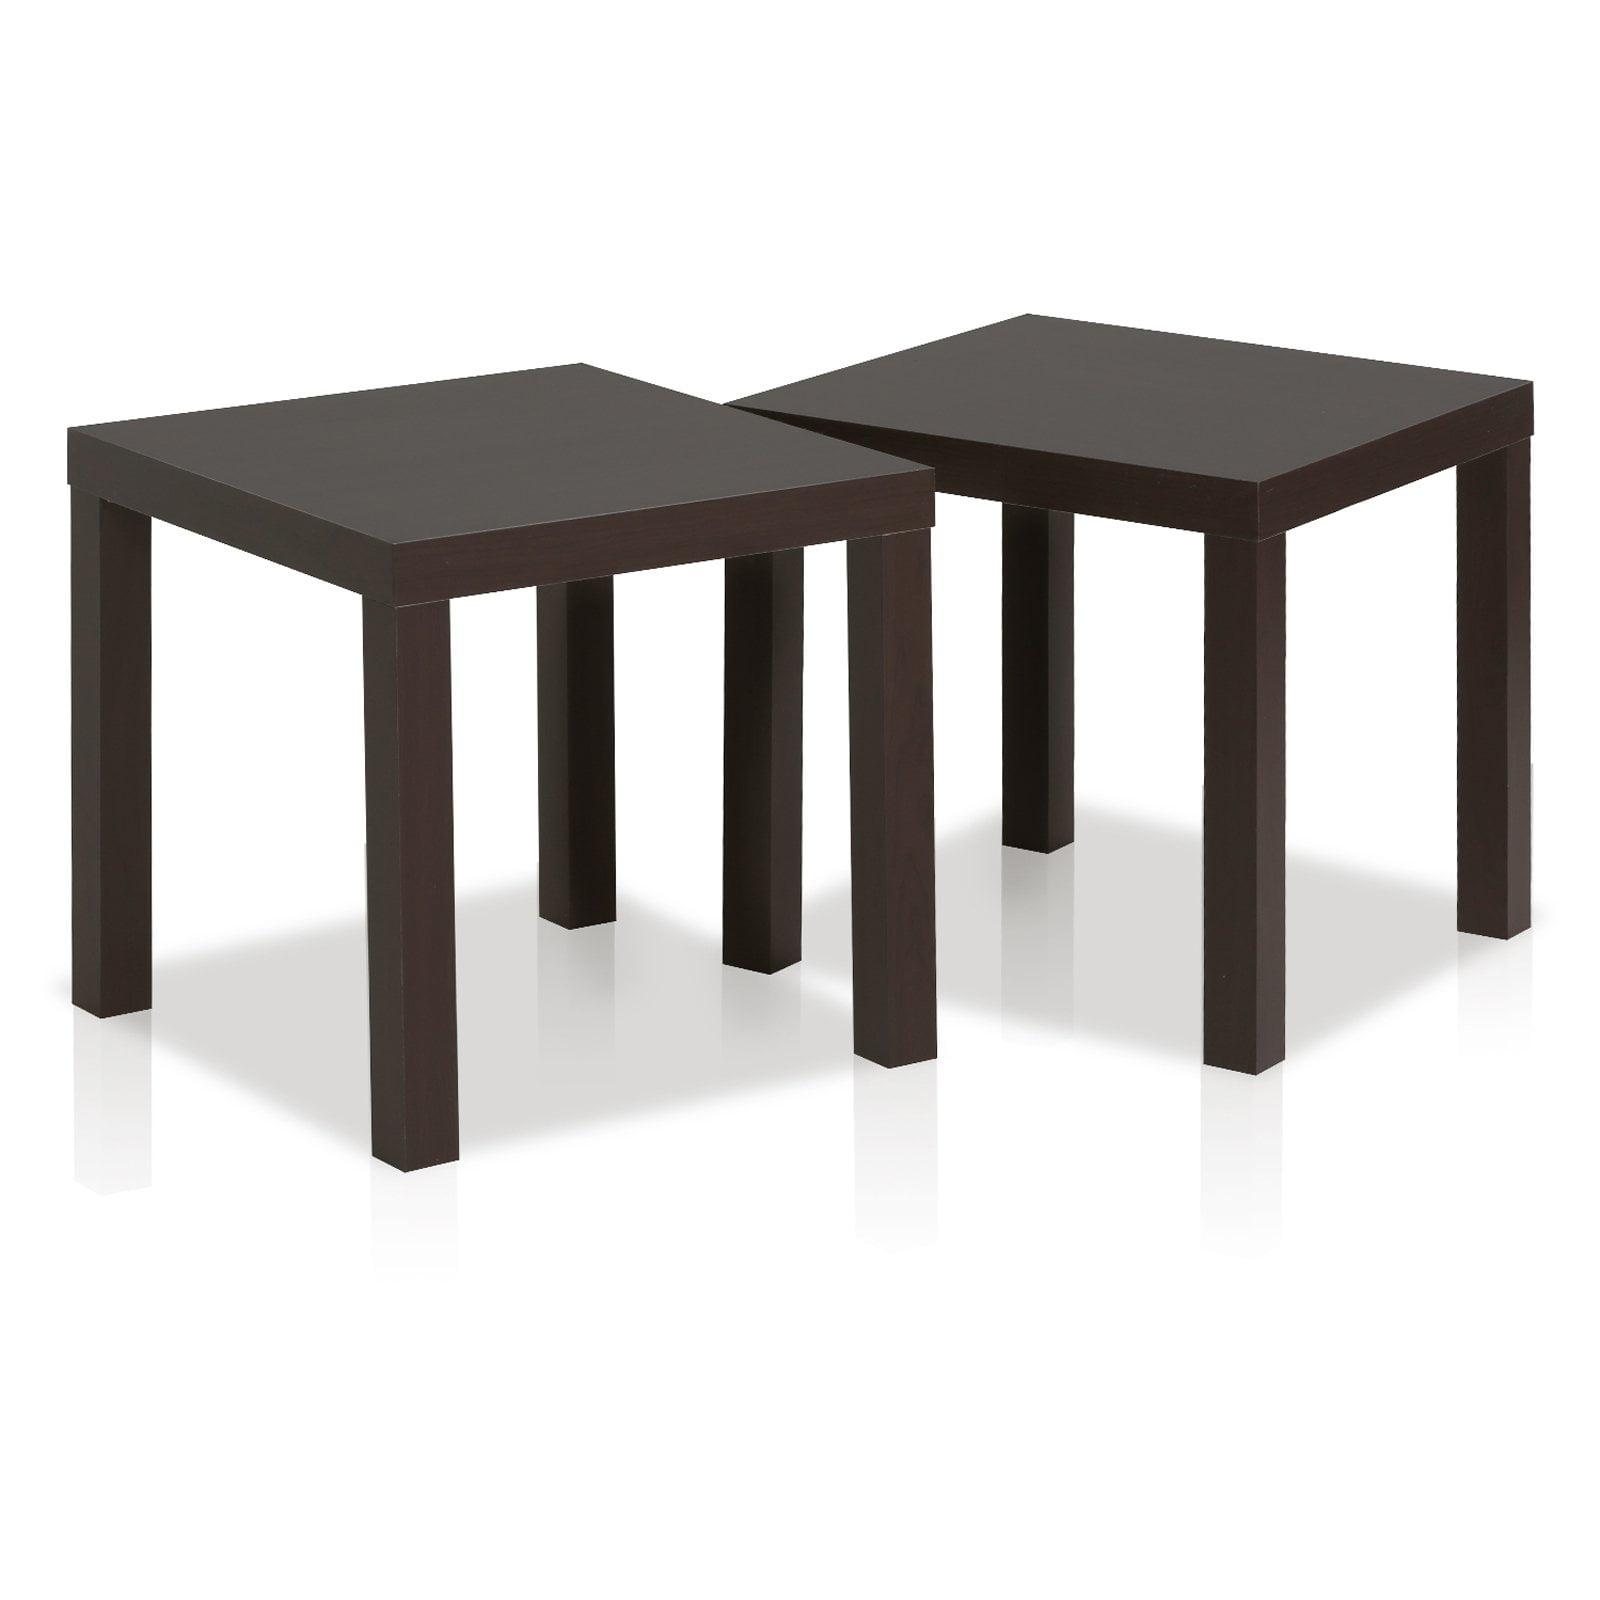 Furinno Classic Cubic End Table, Set of 2, Espresso